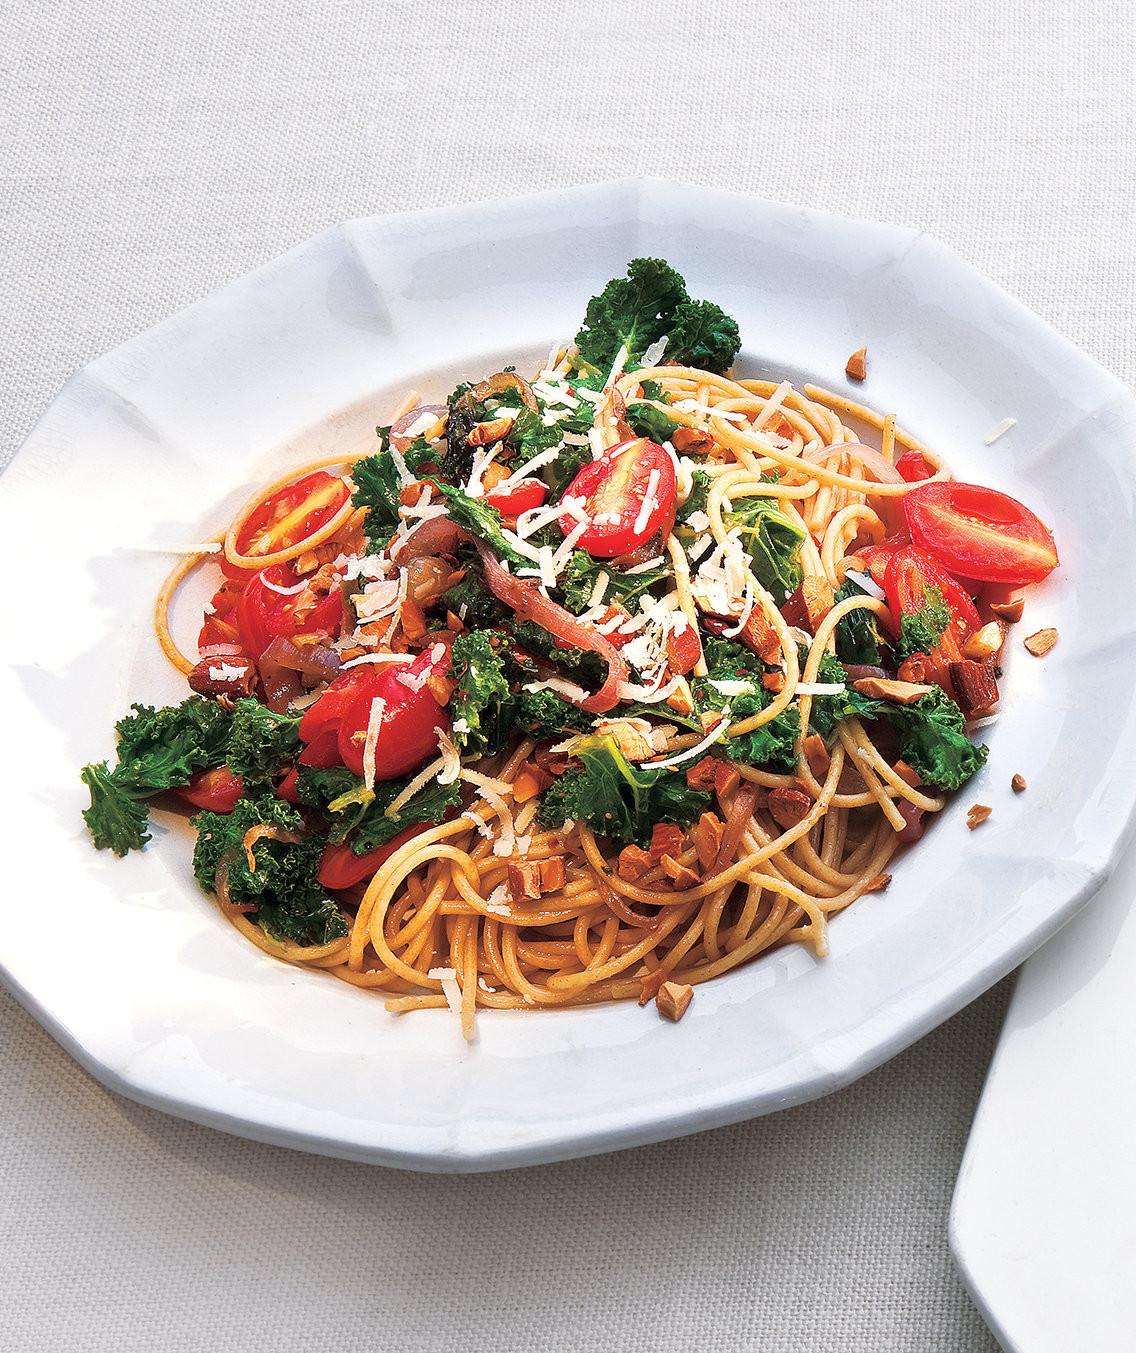 Kale Dinner Recipes  Whole Grain Spaghetti With Kale and Tomatoes Recipe